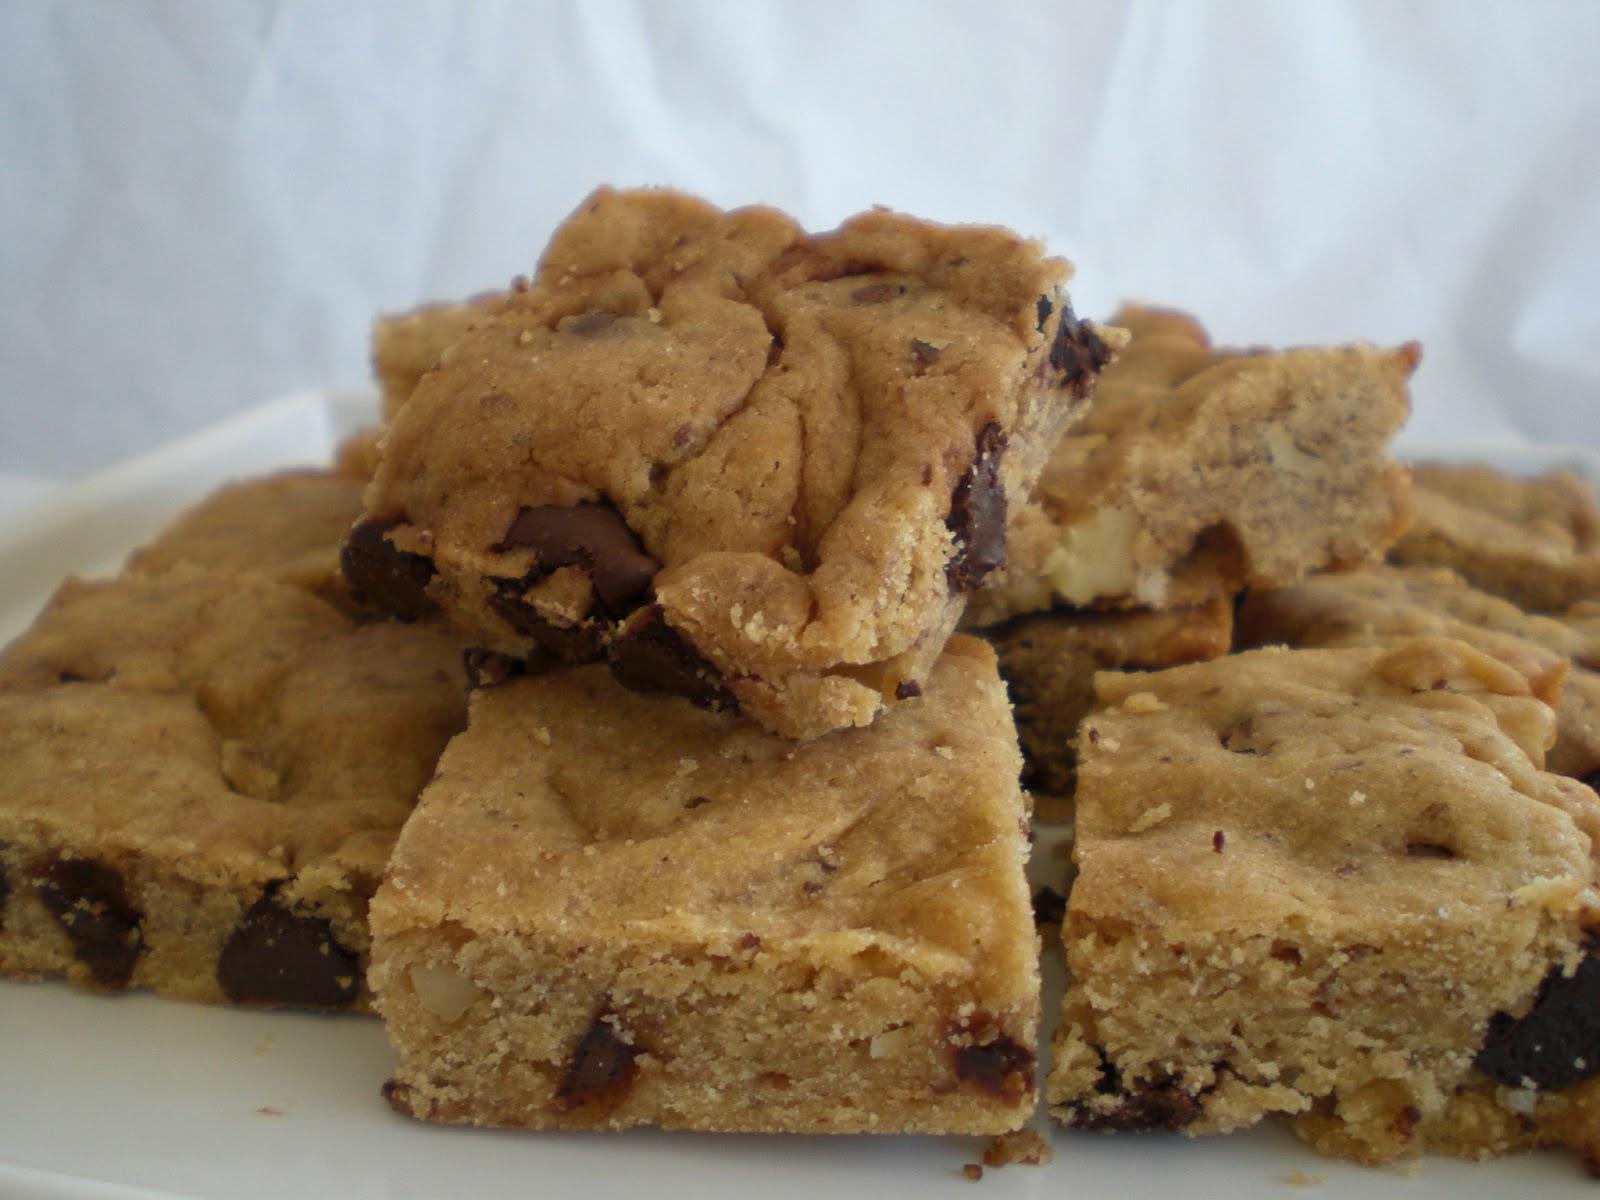 ... Sweet Treats: Dark chocolate chip and walnut blondies (eggless